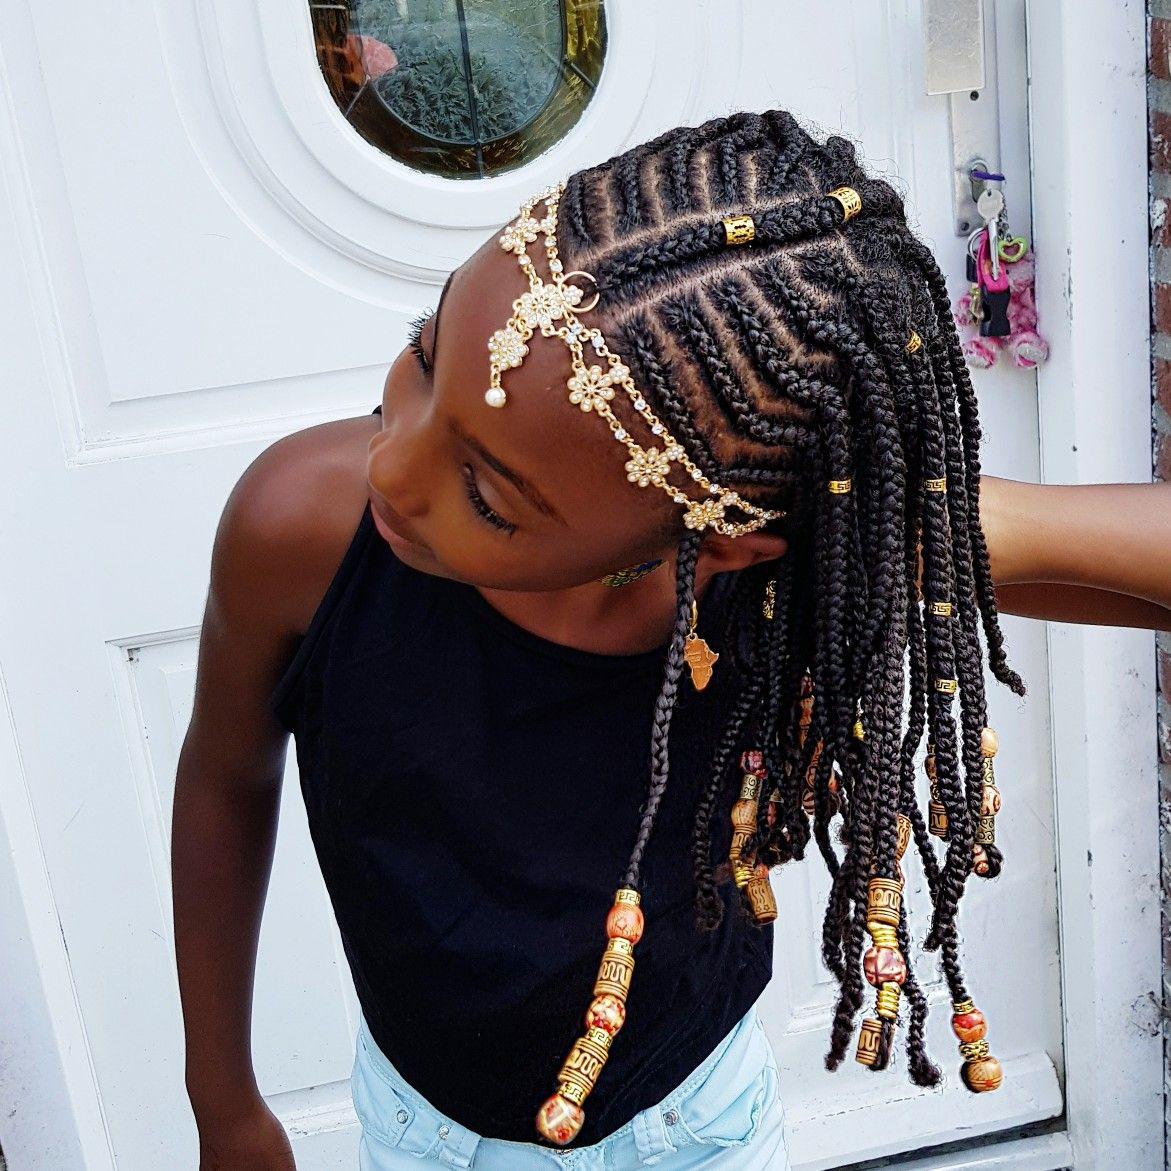 Braided Hairstyles for Little Girls hairstyleforblackwomen.net 281